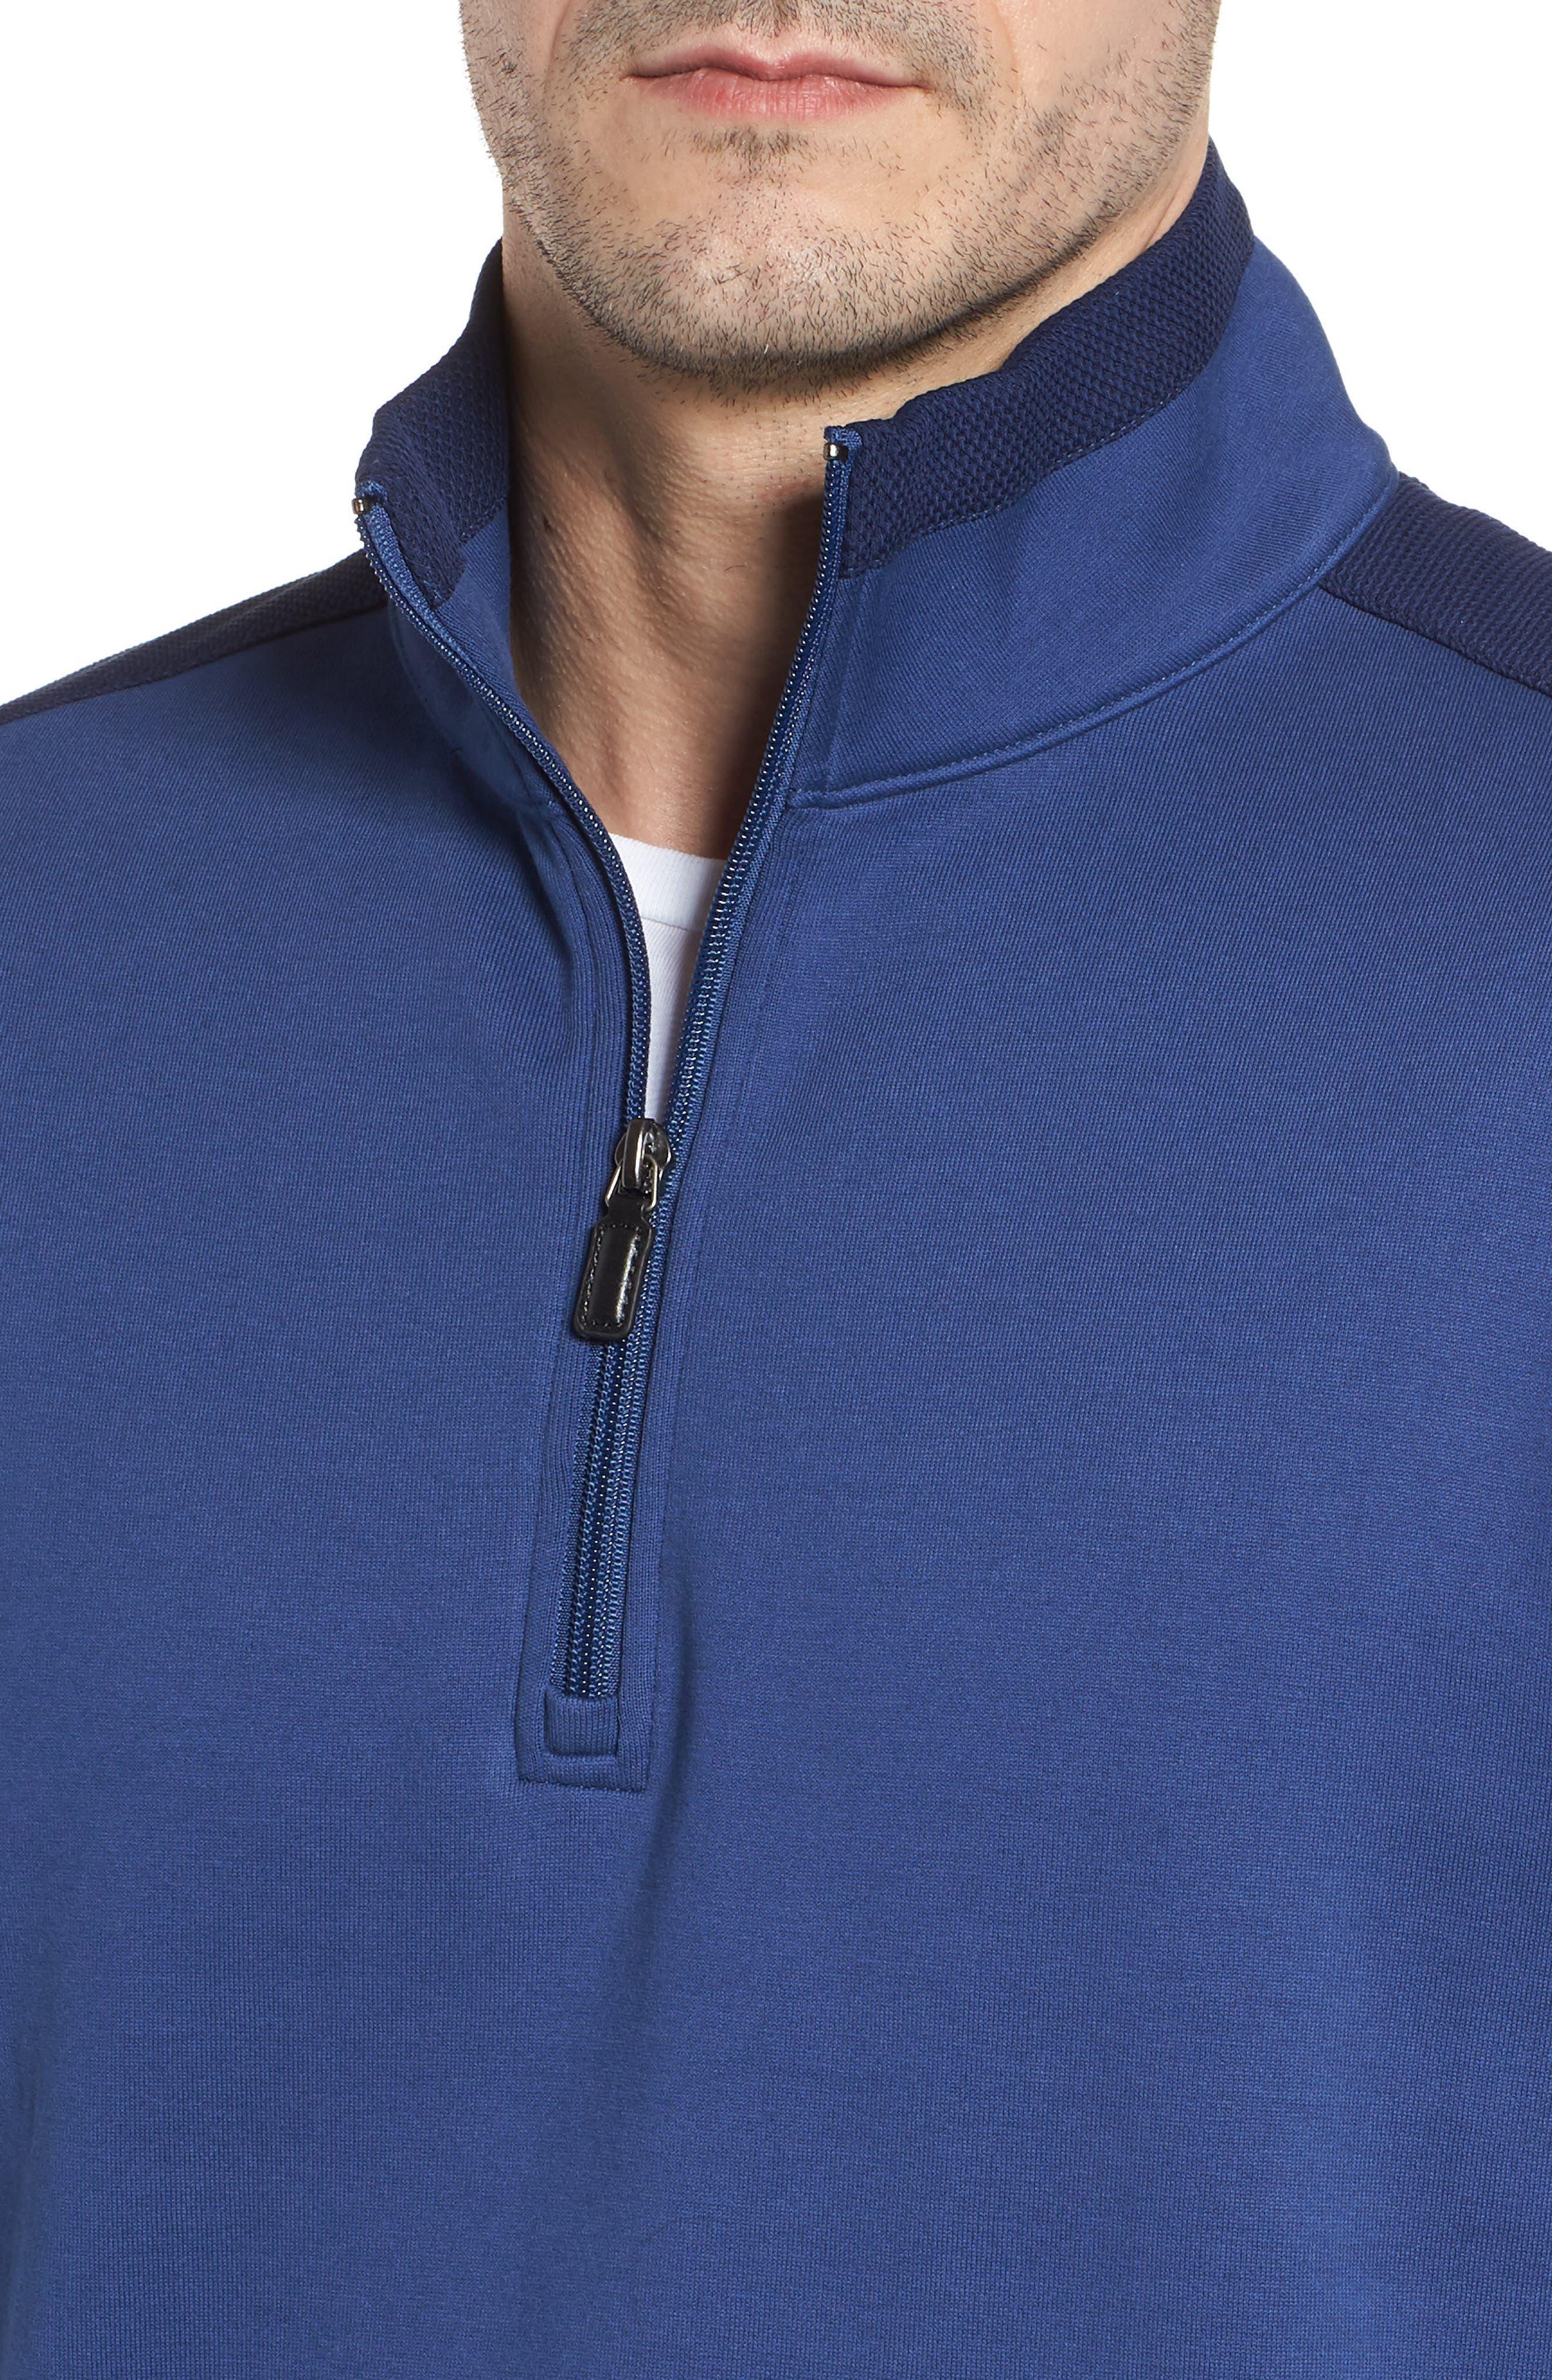 Regular Fit Knit Quarter Zip Pullover,                             Alternate thumbnail 14, color,